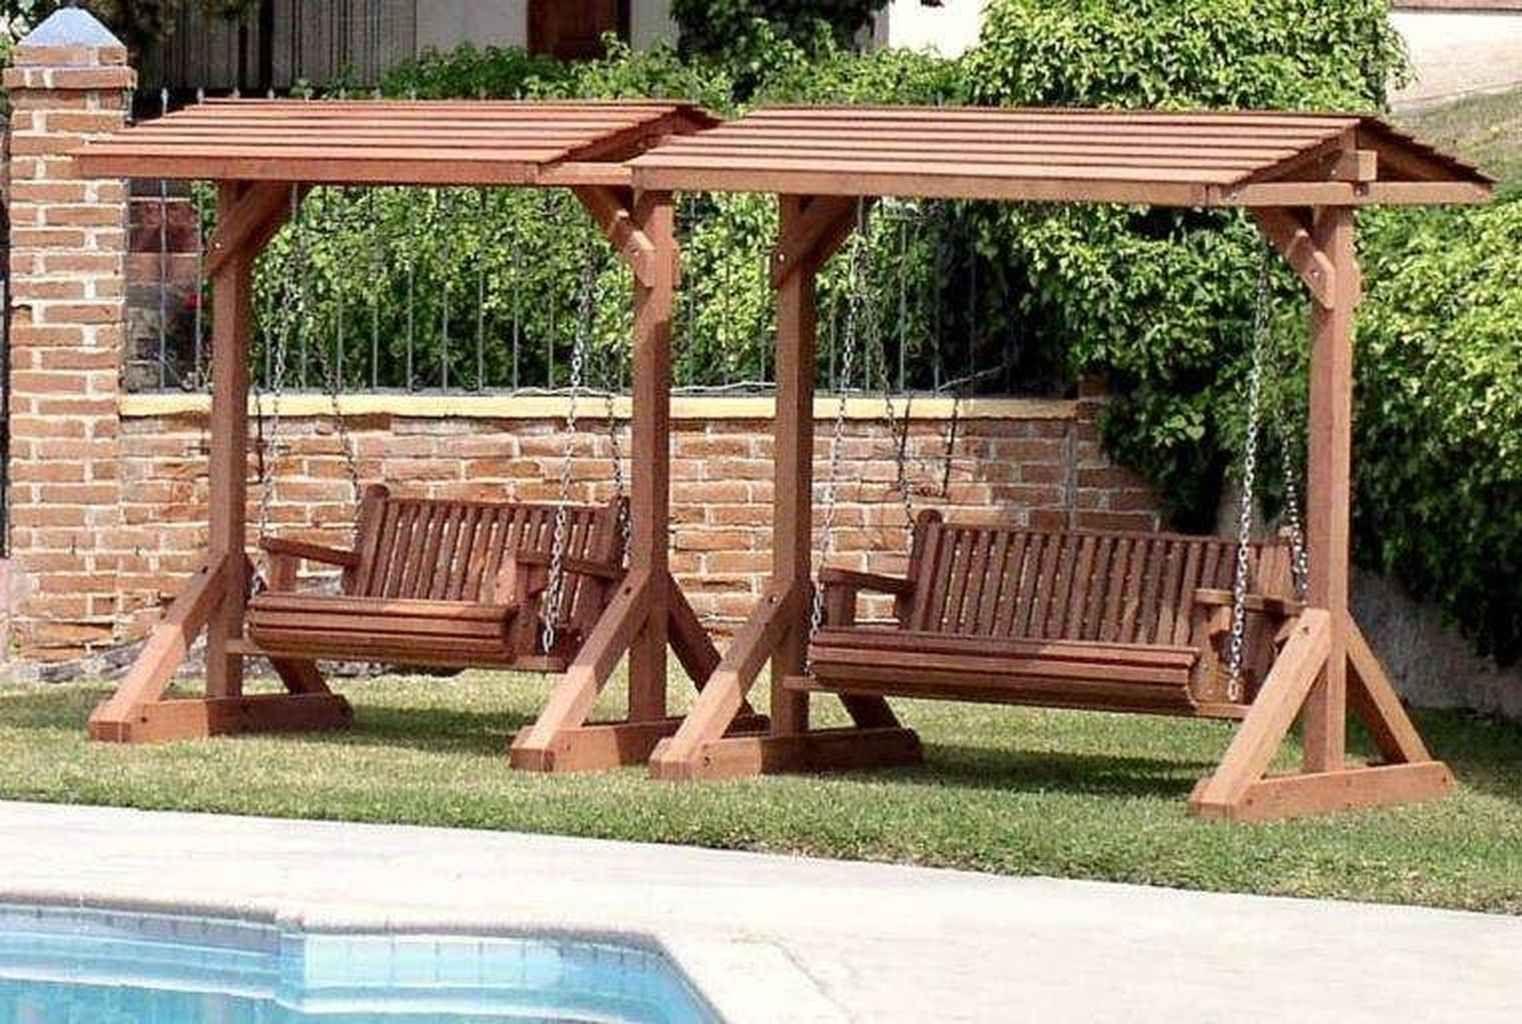 01 Pretty Awesome Garden Swing Seats Ideas For Backyard Relaxing Decoradeas Outdoor Patio Swing Patio Swing Outdoor Swing With Canopy